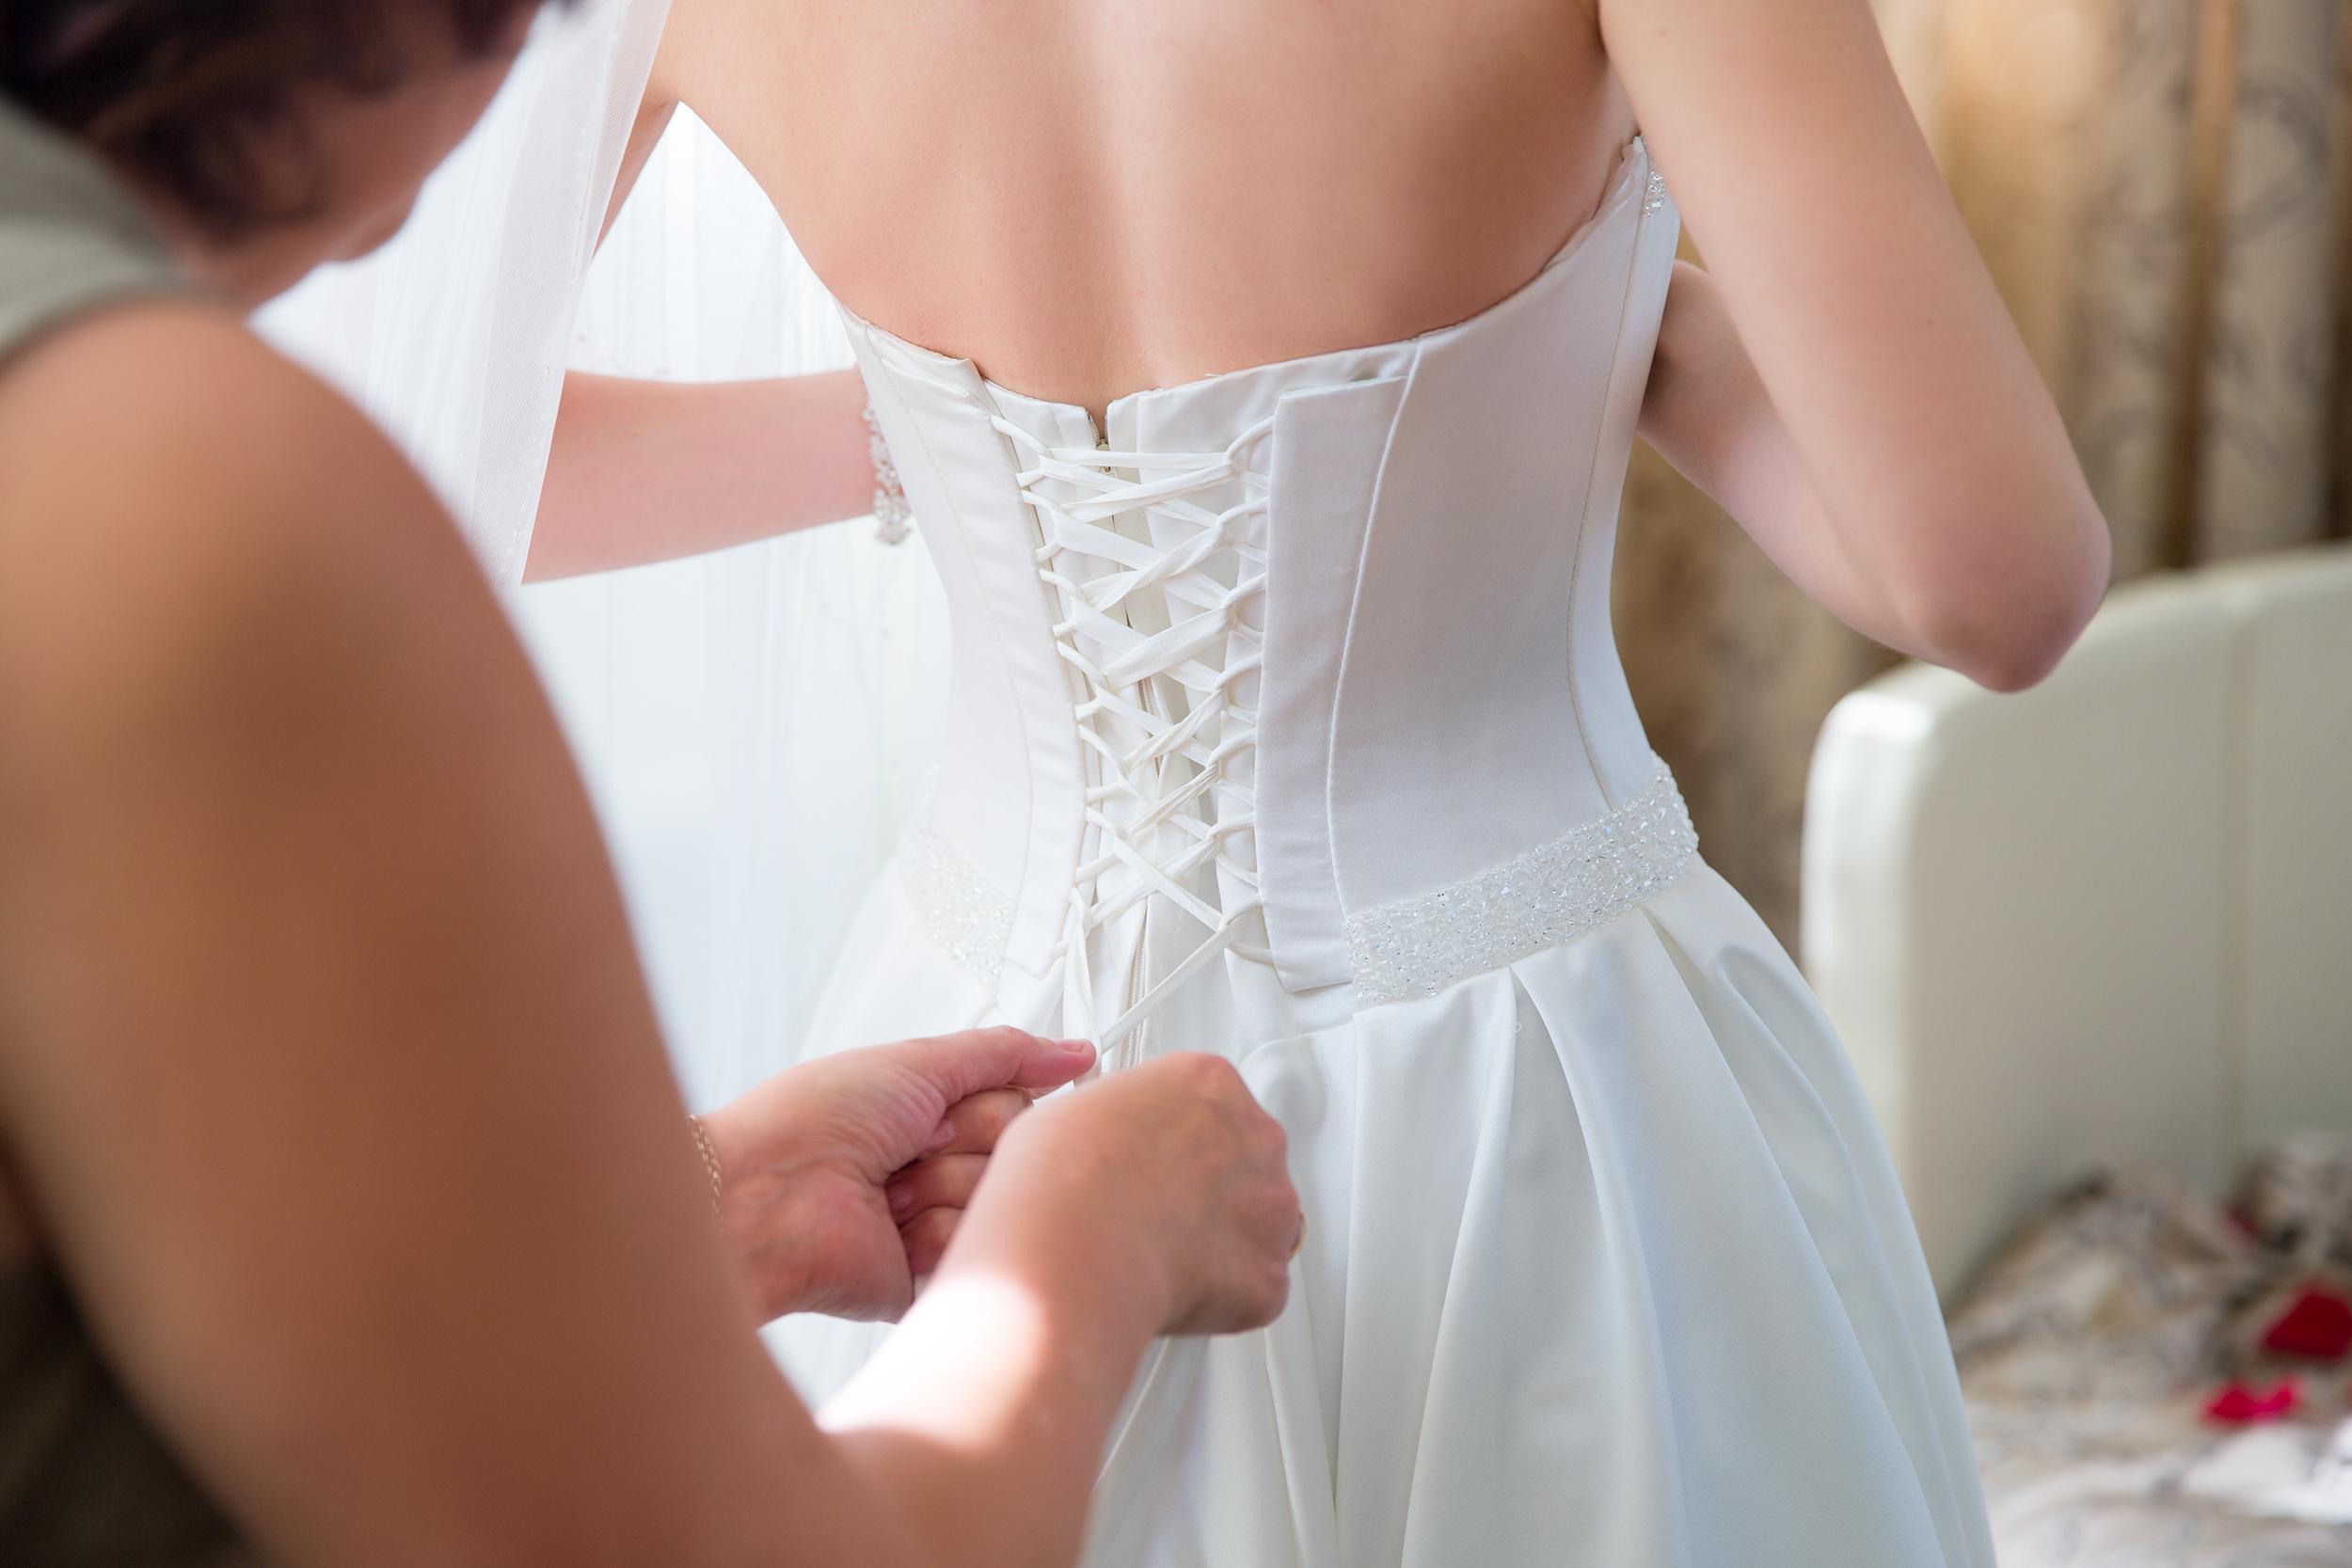 Bride,Wearing,Wedding,Dress